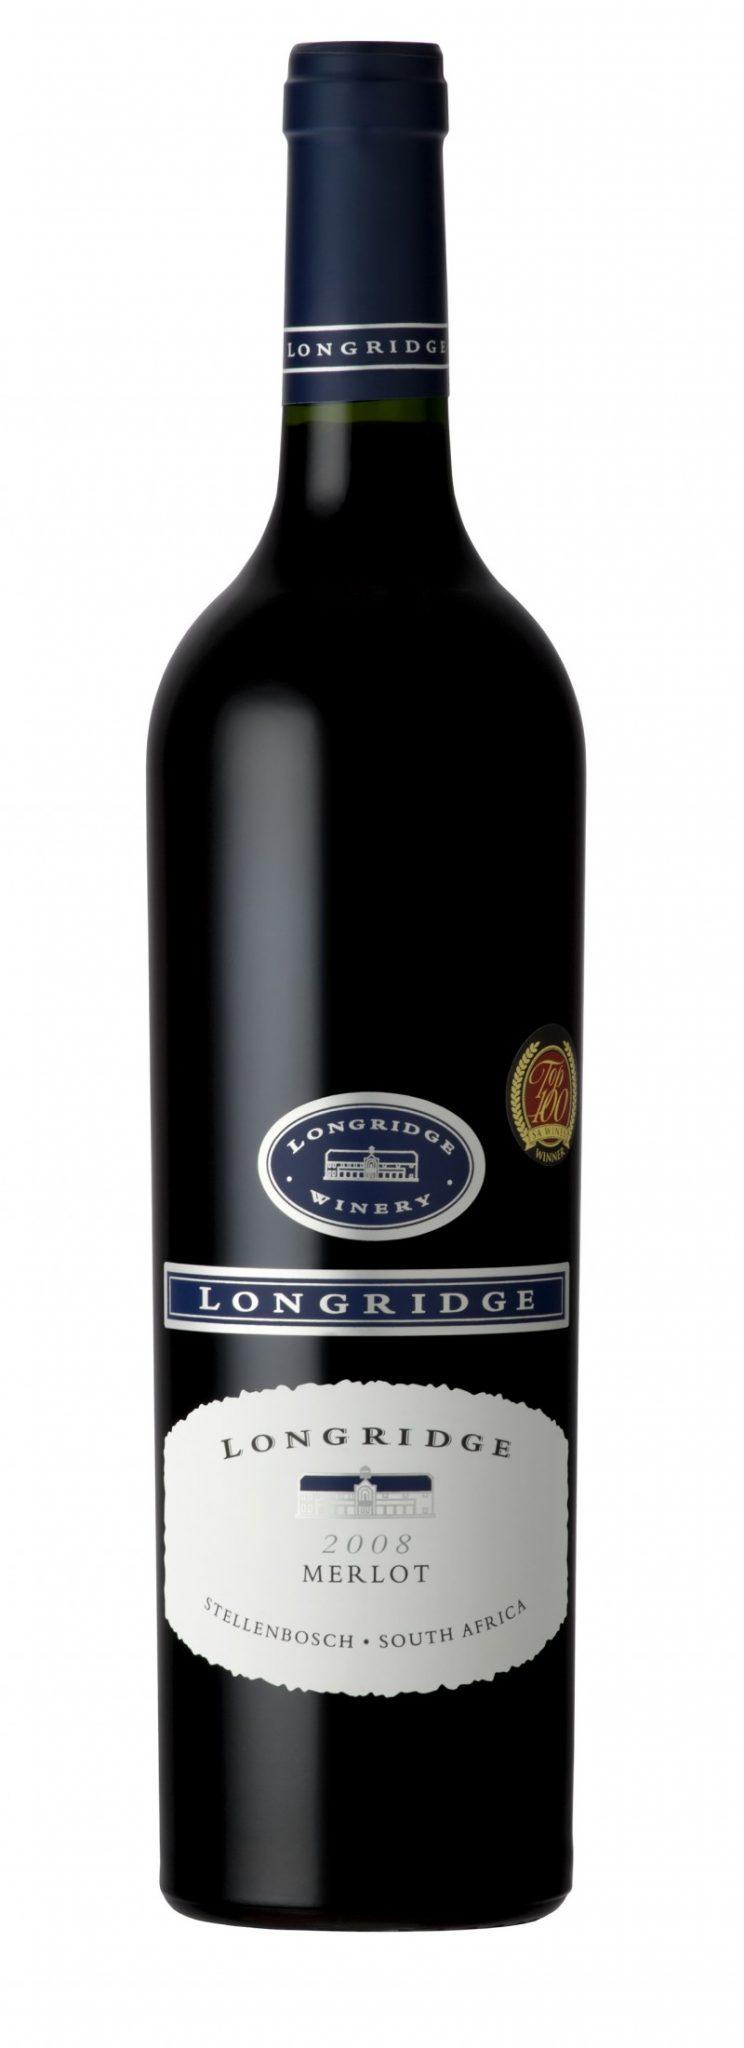 Longridge-Merlot-2008